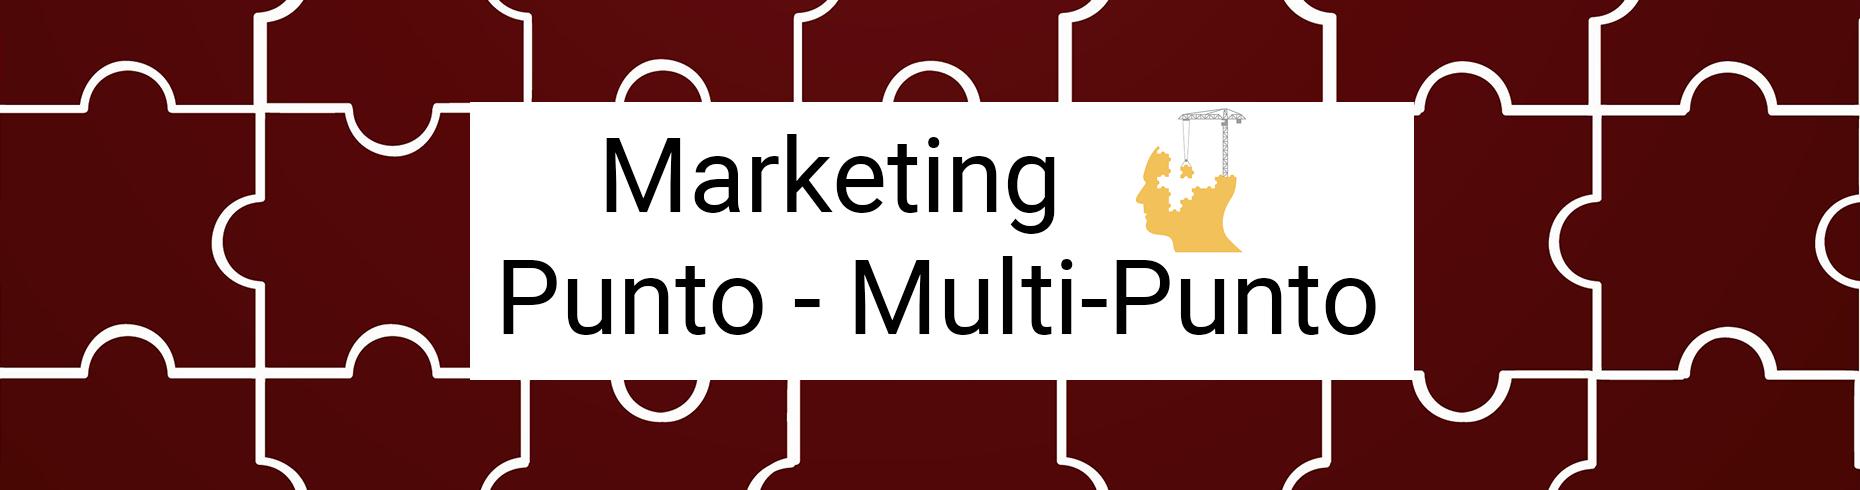 Marketing Punto - Multi-Punto